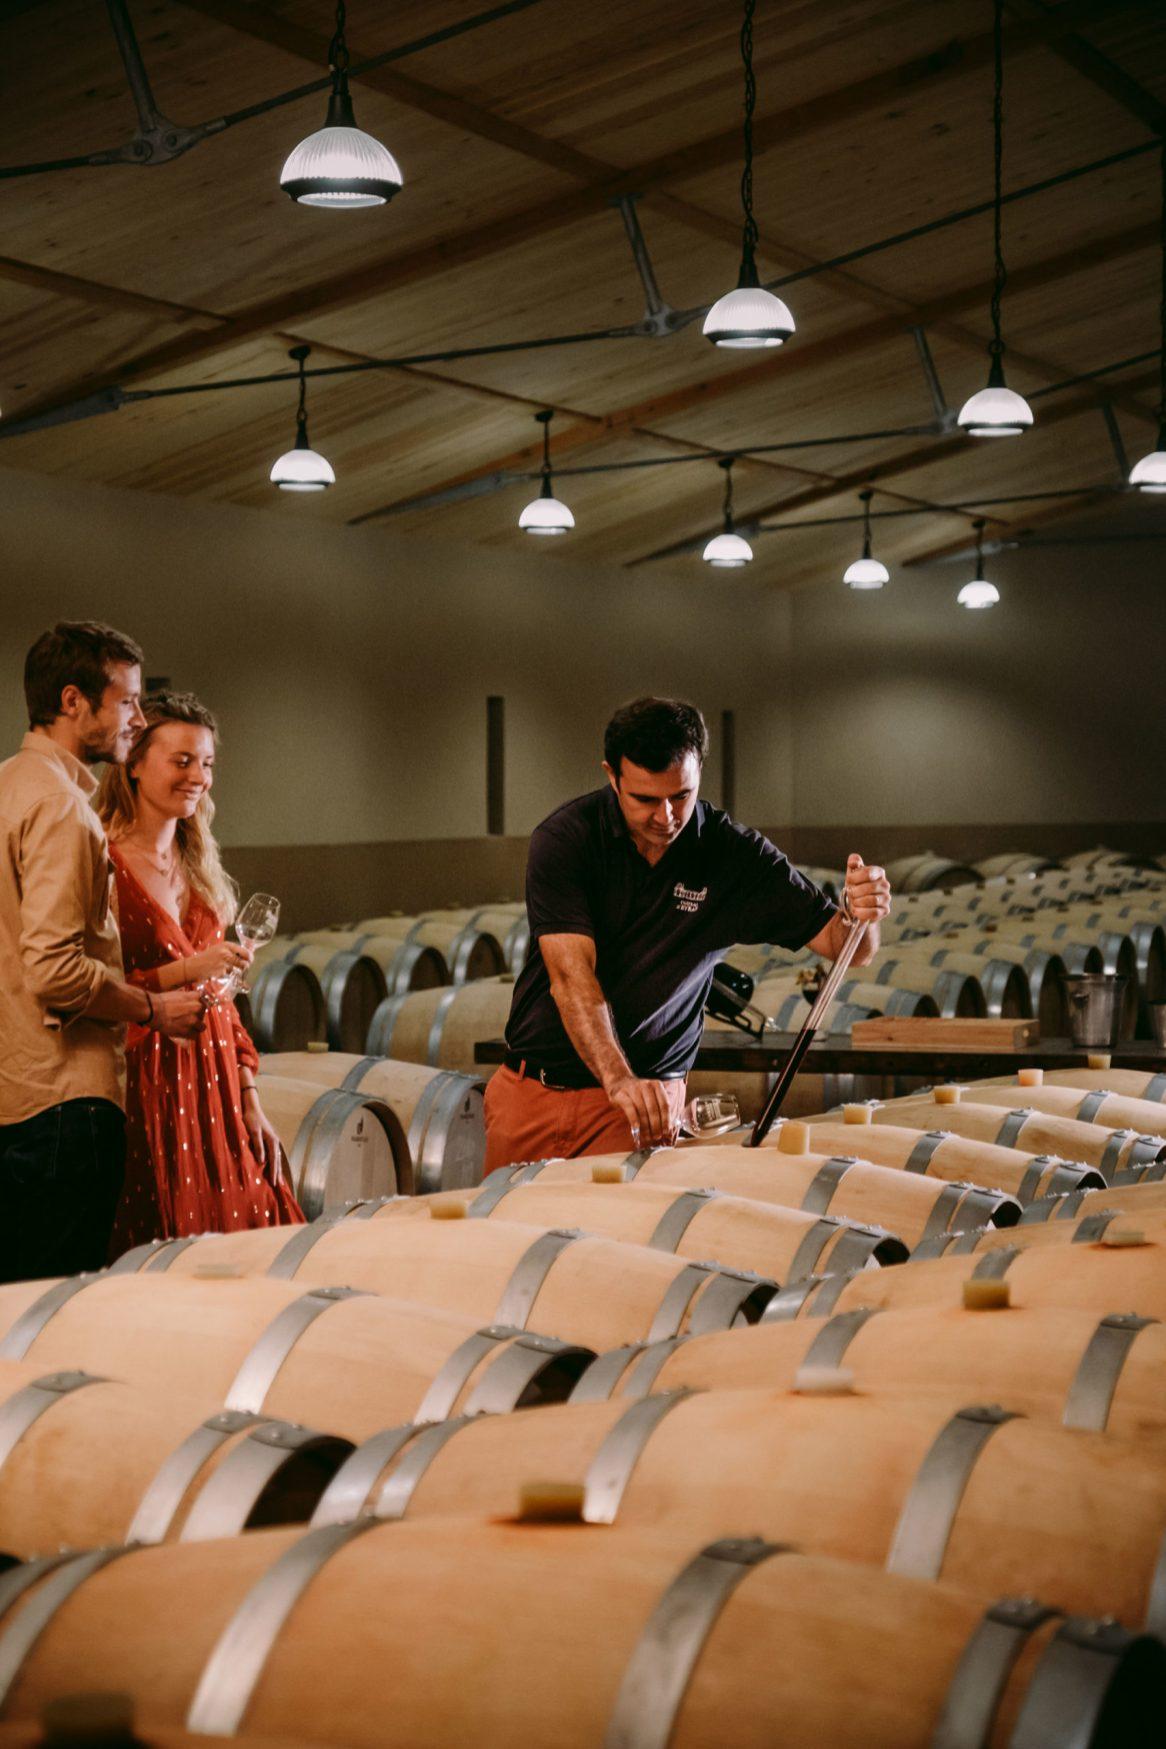 Vine adopters visiting the Château d'Eyran near Bordeaux